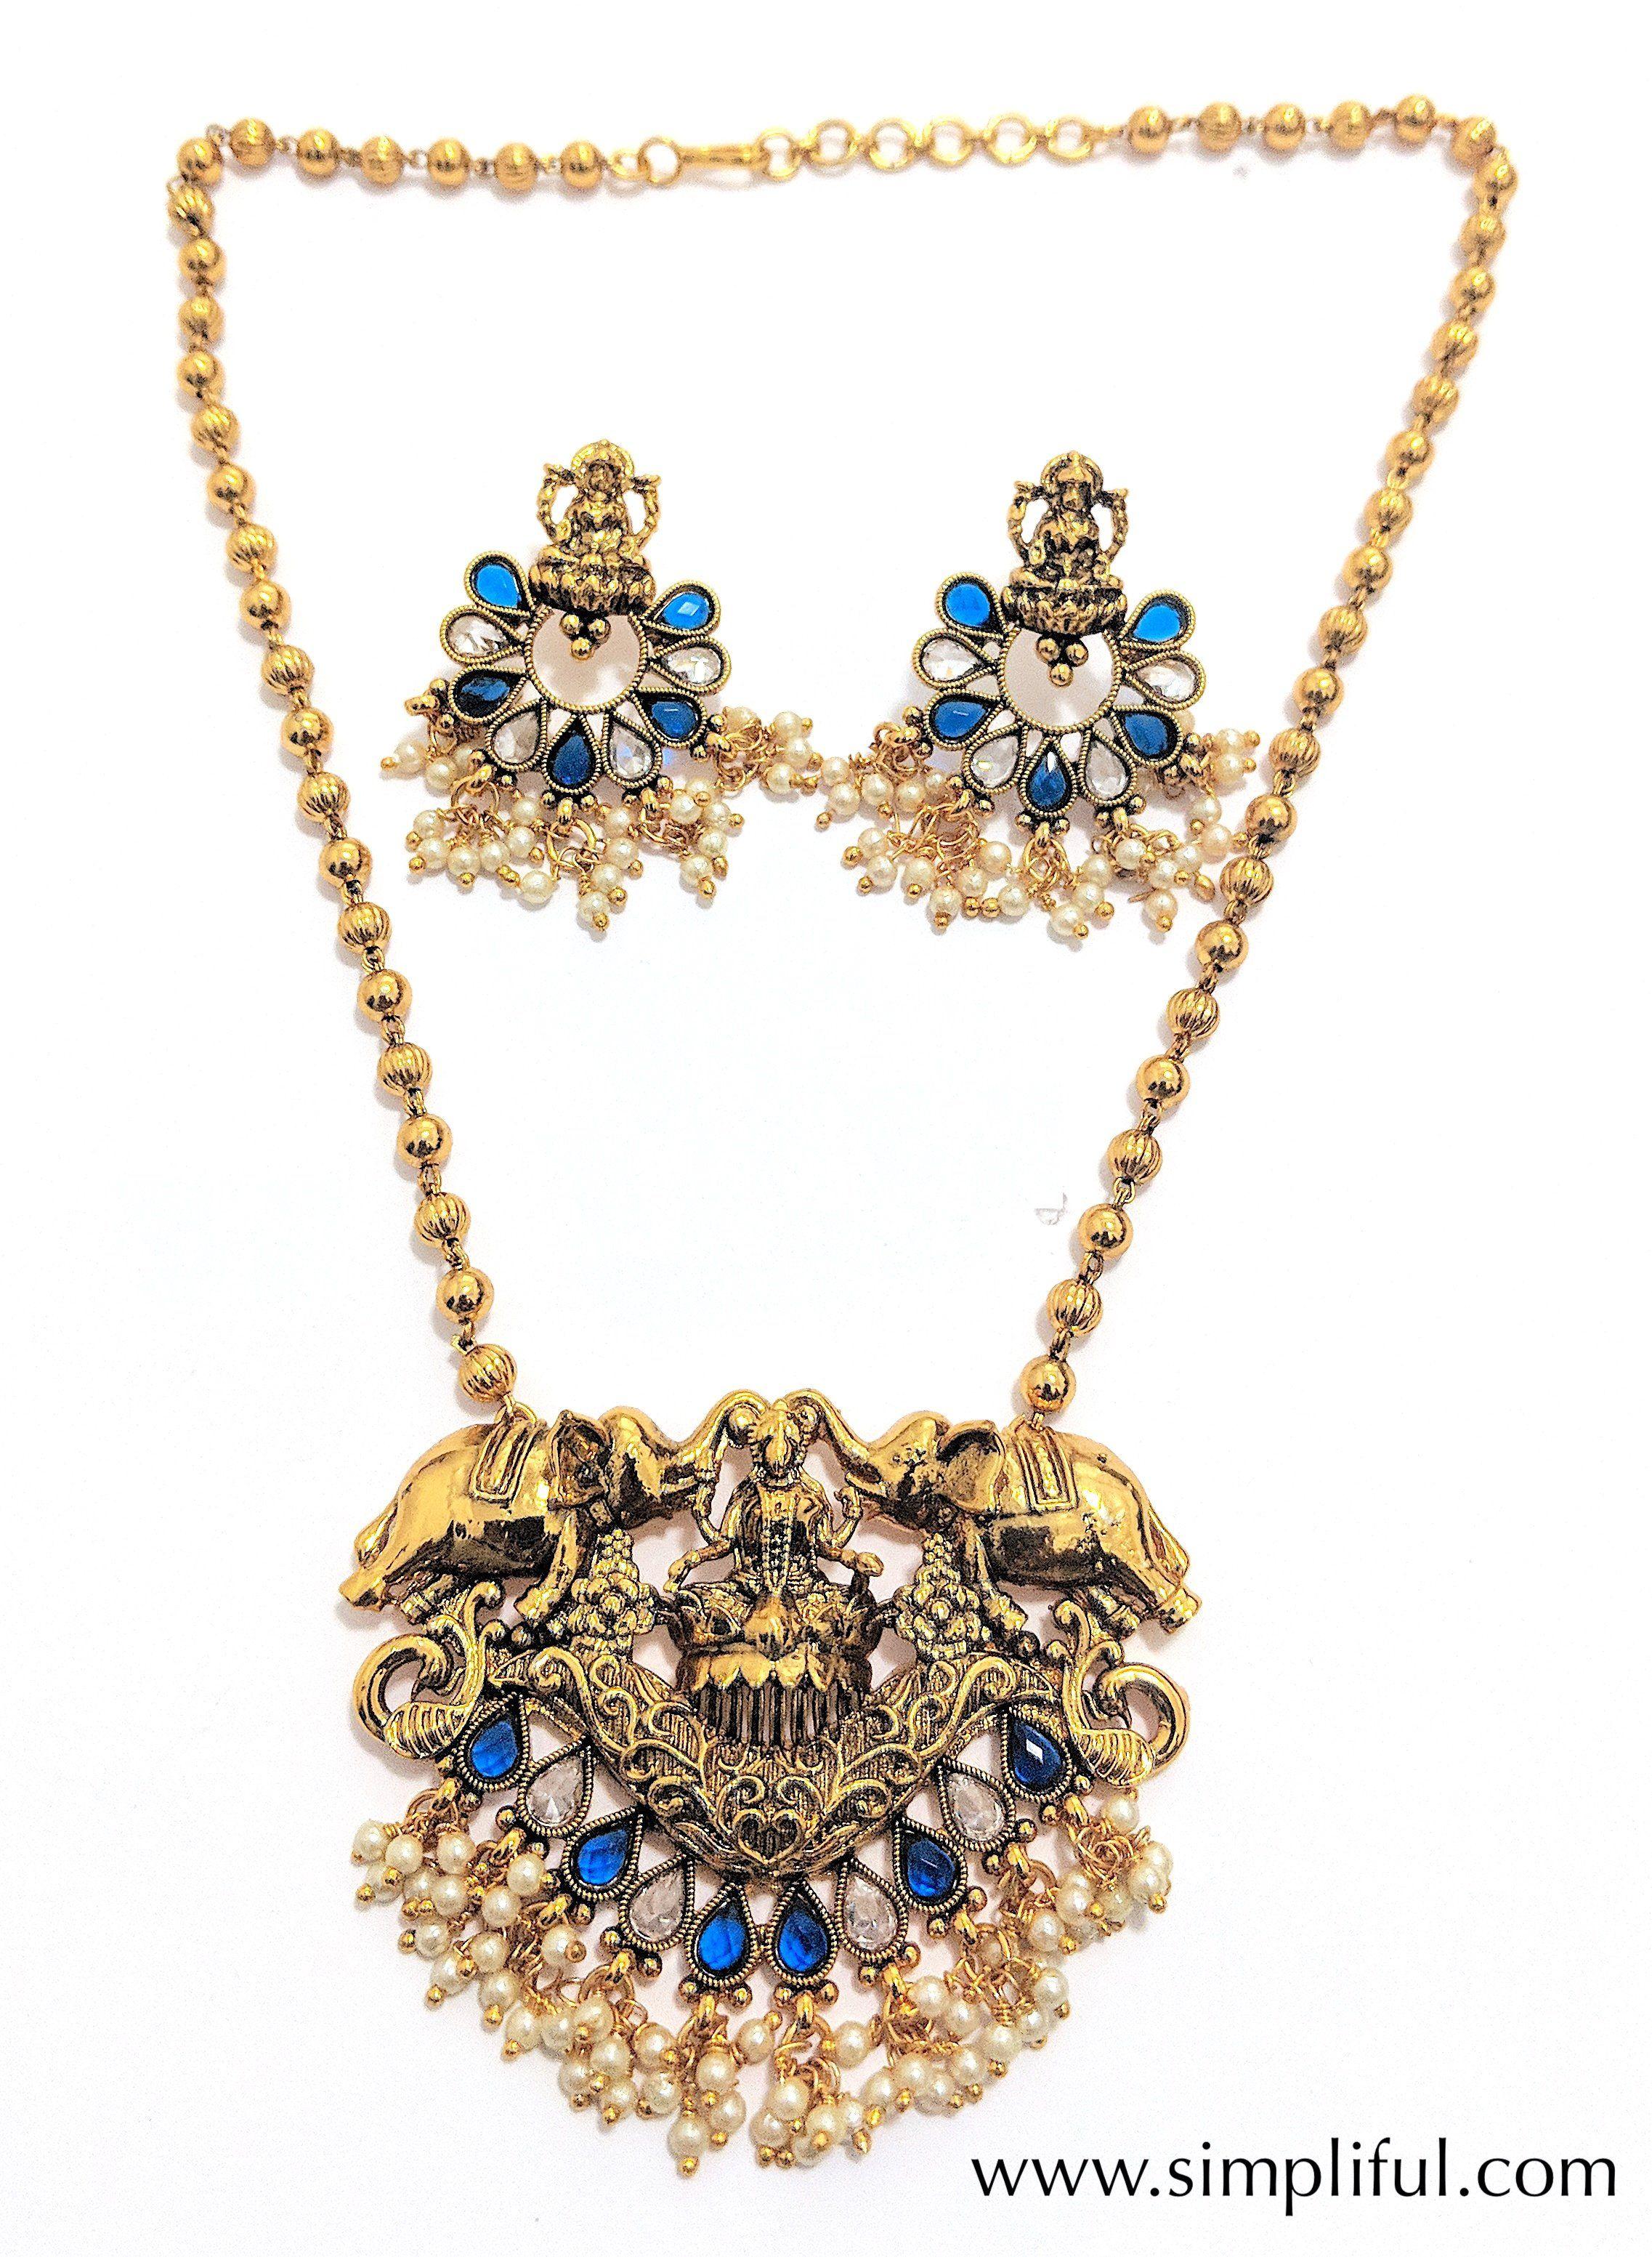 Traditional goddess lakshmi pendant necklace and earring set